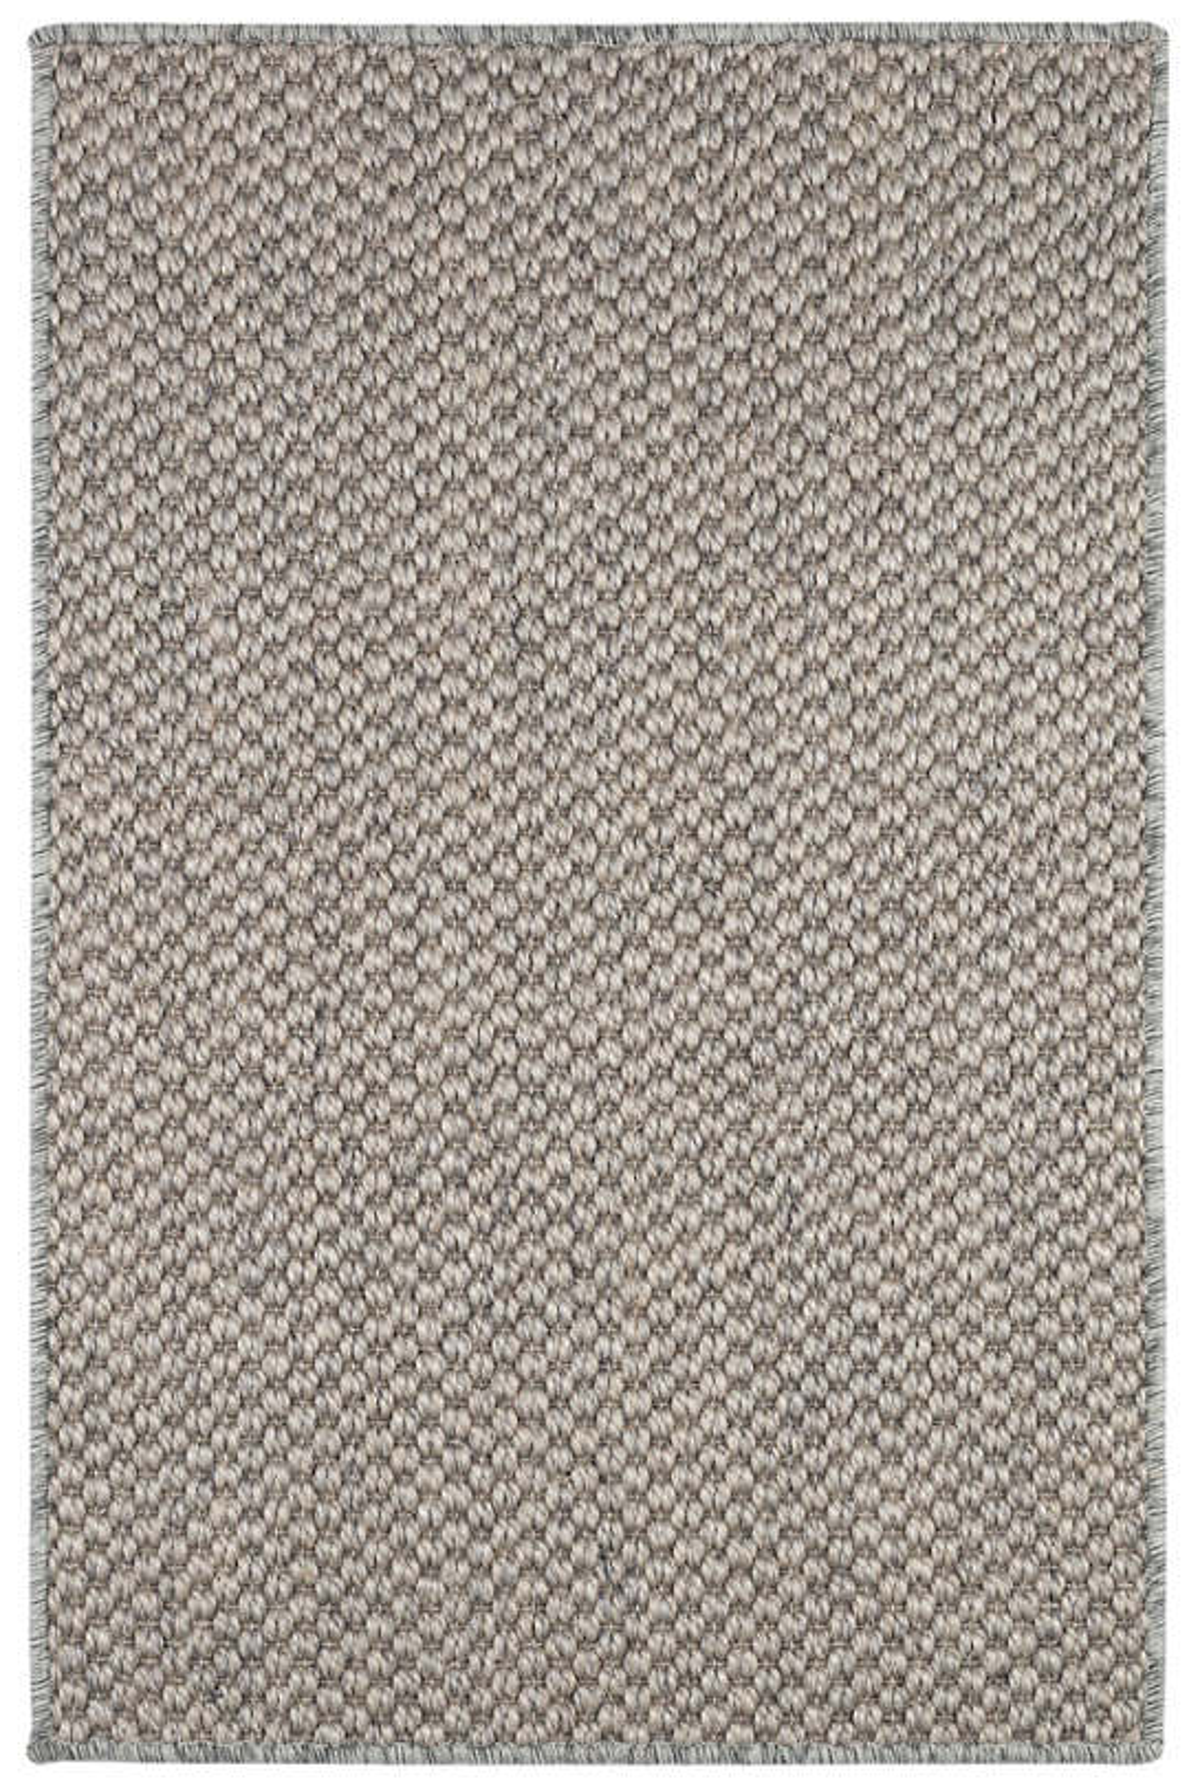 Corden Silver Woven Sisal Custom Rug With Pad